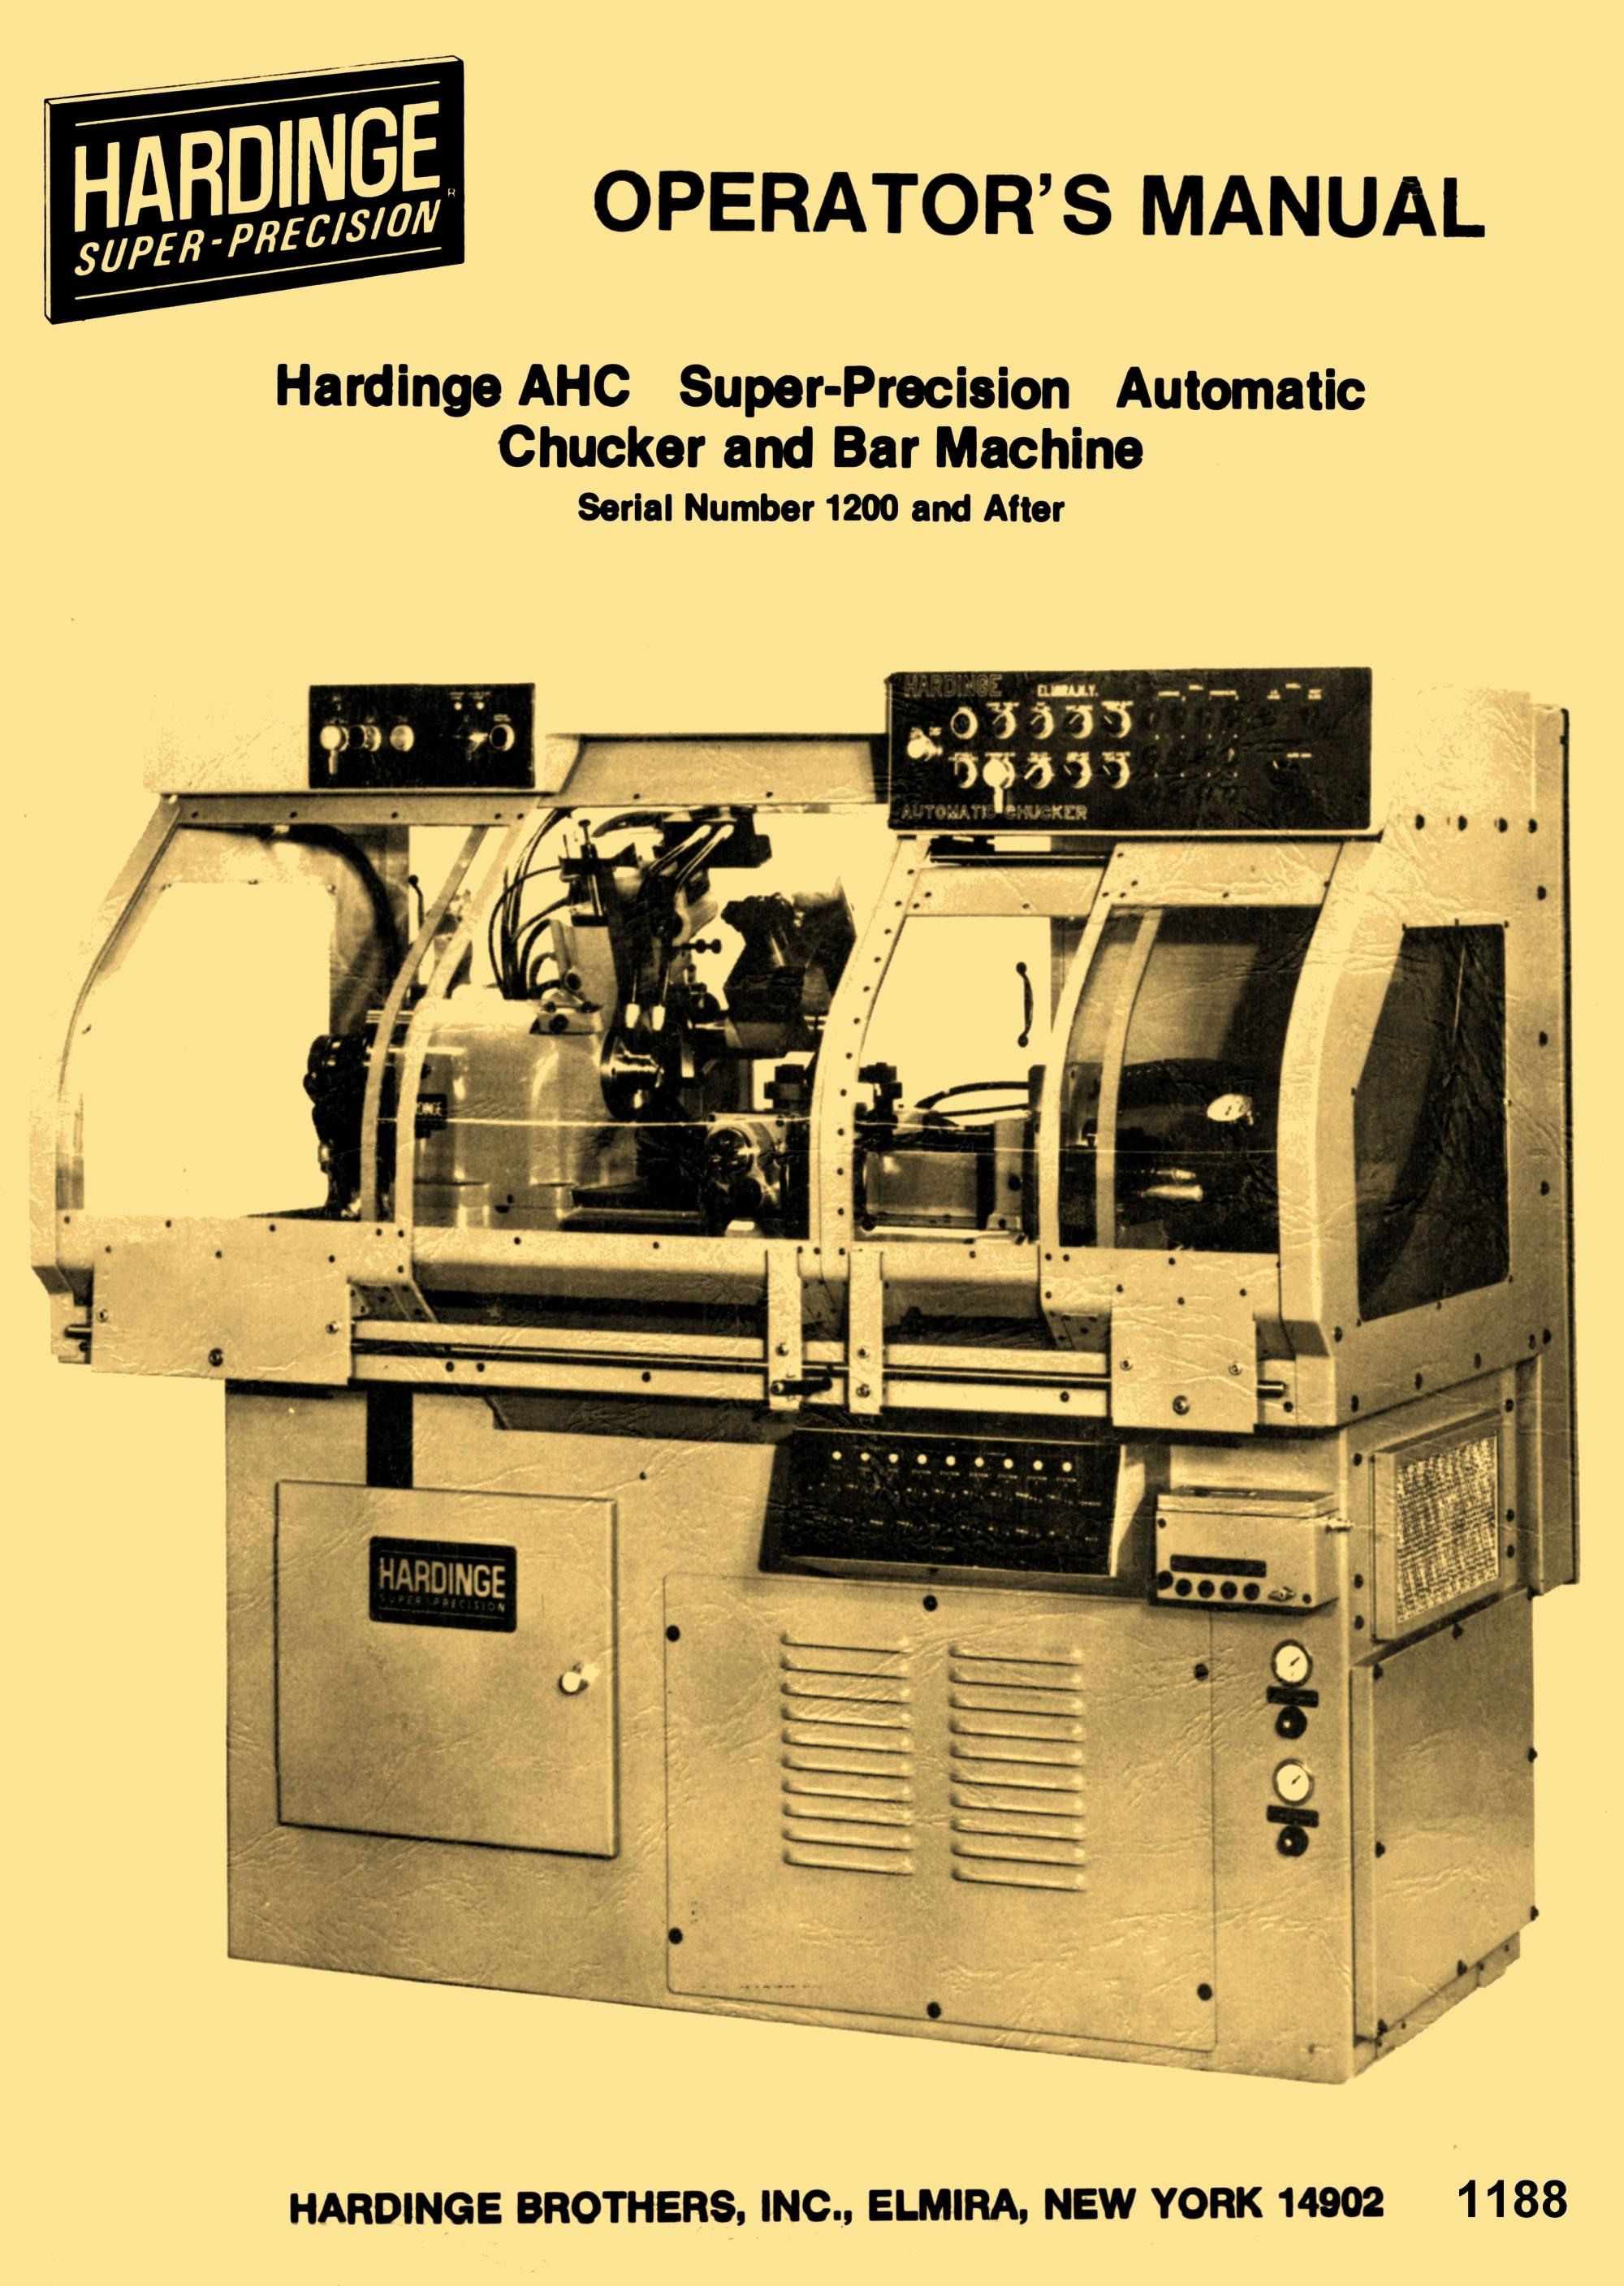 hight resolution of atlas lathe parts diagram hardinge ahc automatic chucking bar machine lathe operators manual of atlas